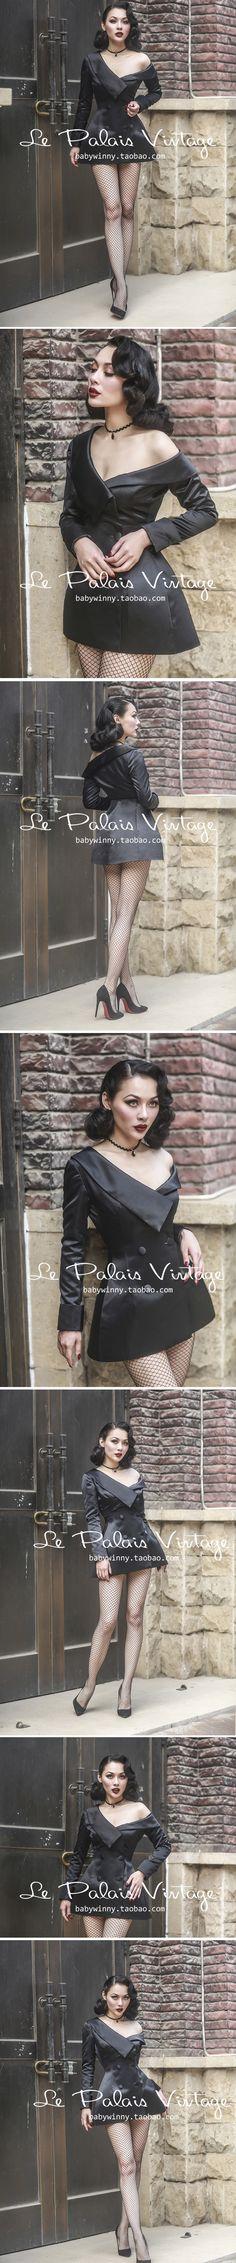 Has potential as a burlesque outfit. Sexy Outfits, Pretty Outfits, Pretty Clothes, La Palais Vintage, Vintage Outfits, Vintage Fashion, In Pantyhose, Nylons, Le Palais